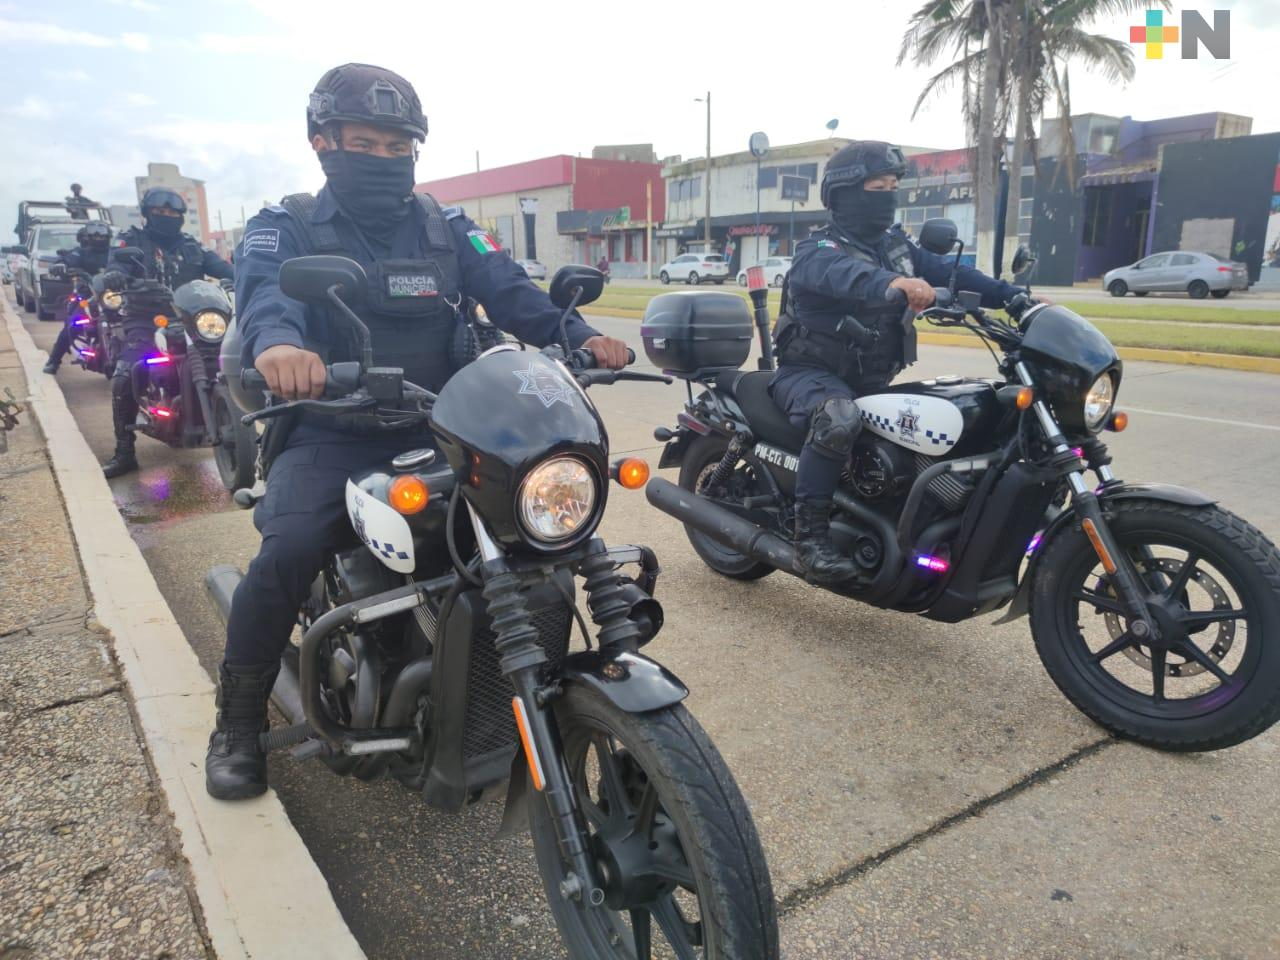 Inició operativo de seguridad en el malecón costero de Coatzacoalcos